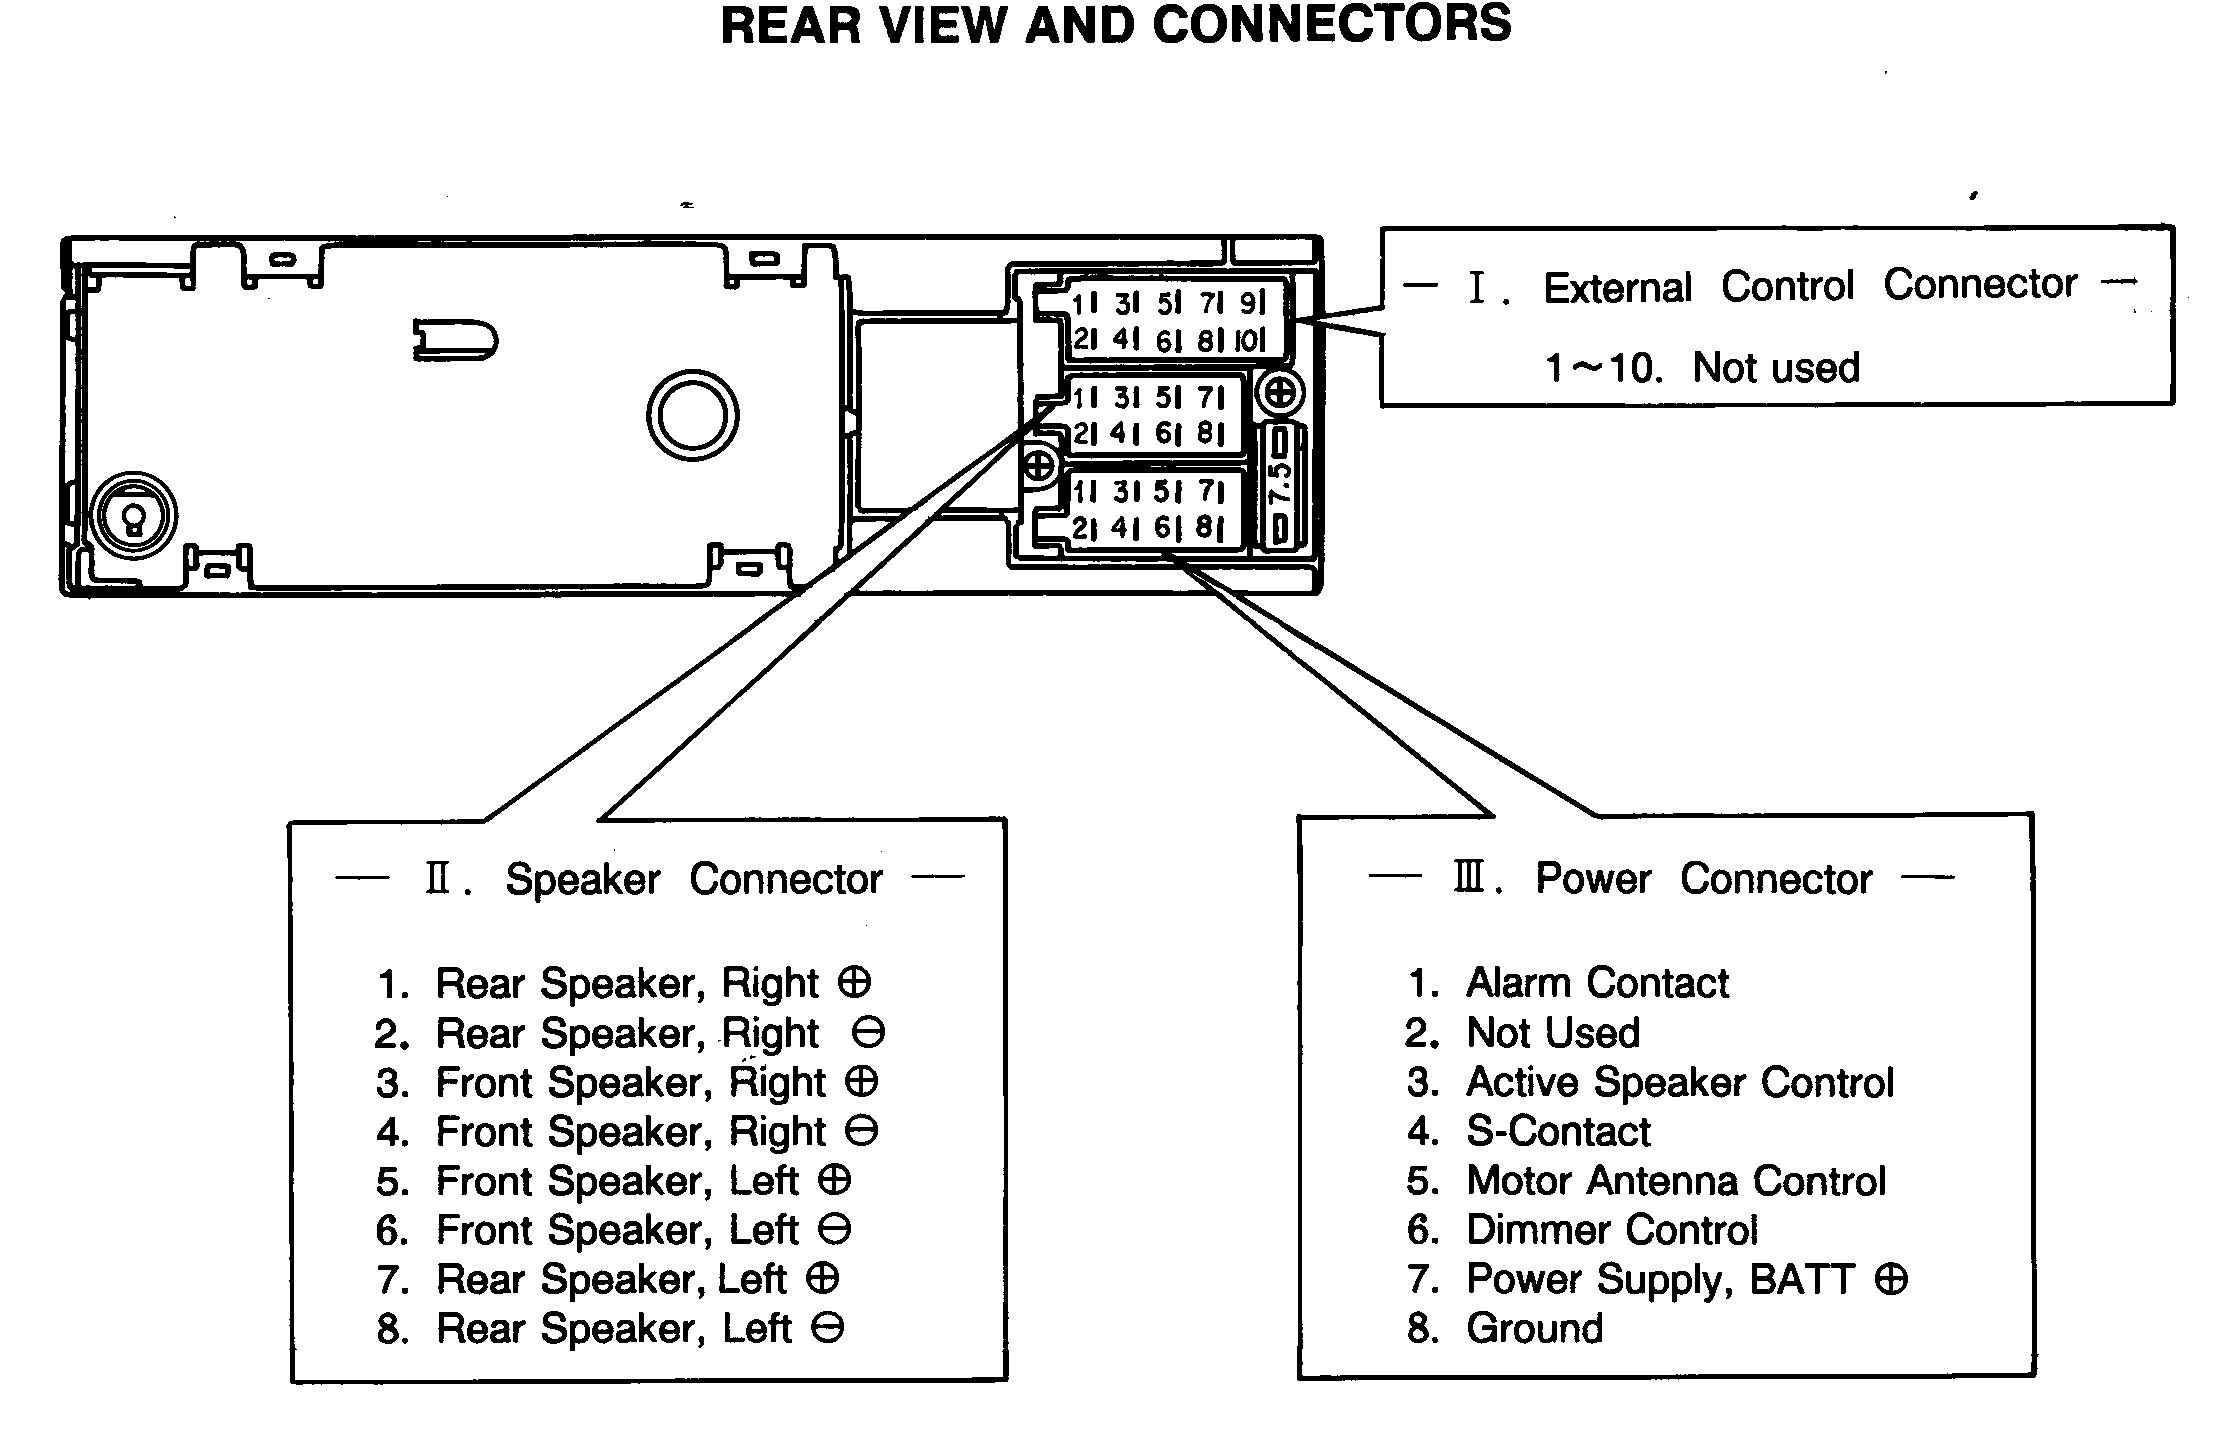 Factory Car Stereo Wiring Diagrams Honda Stereo Wiring Diagram Blurts Of Factory Car Stereo Wiring Diagrams